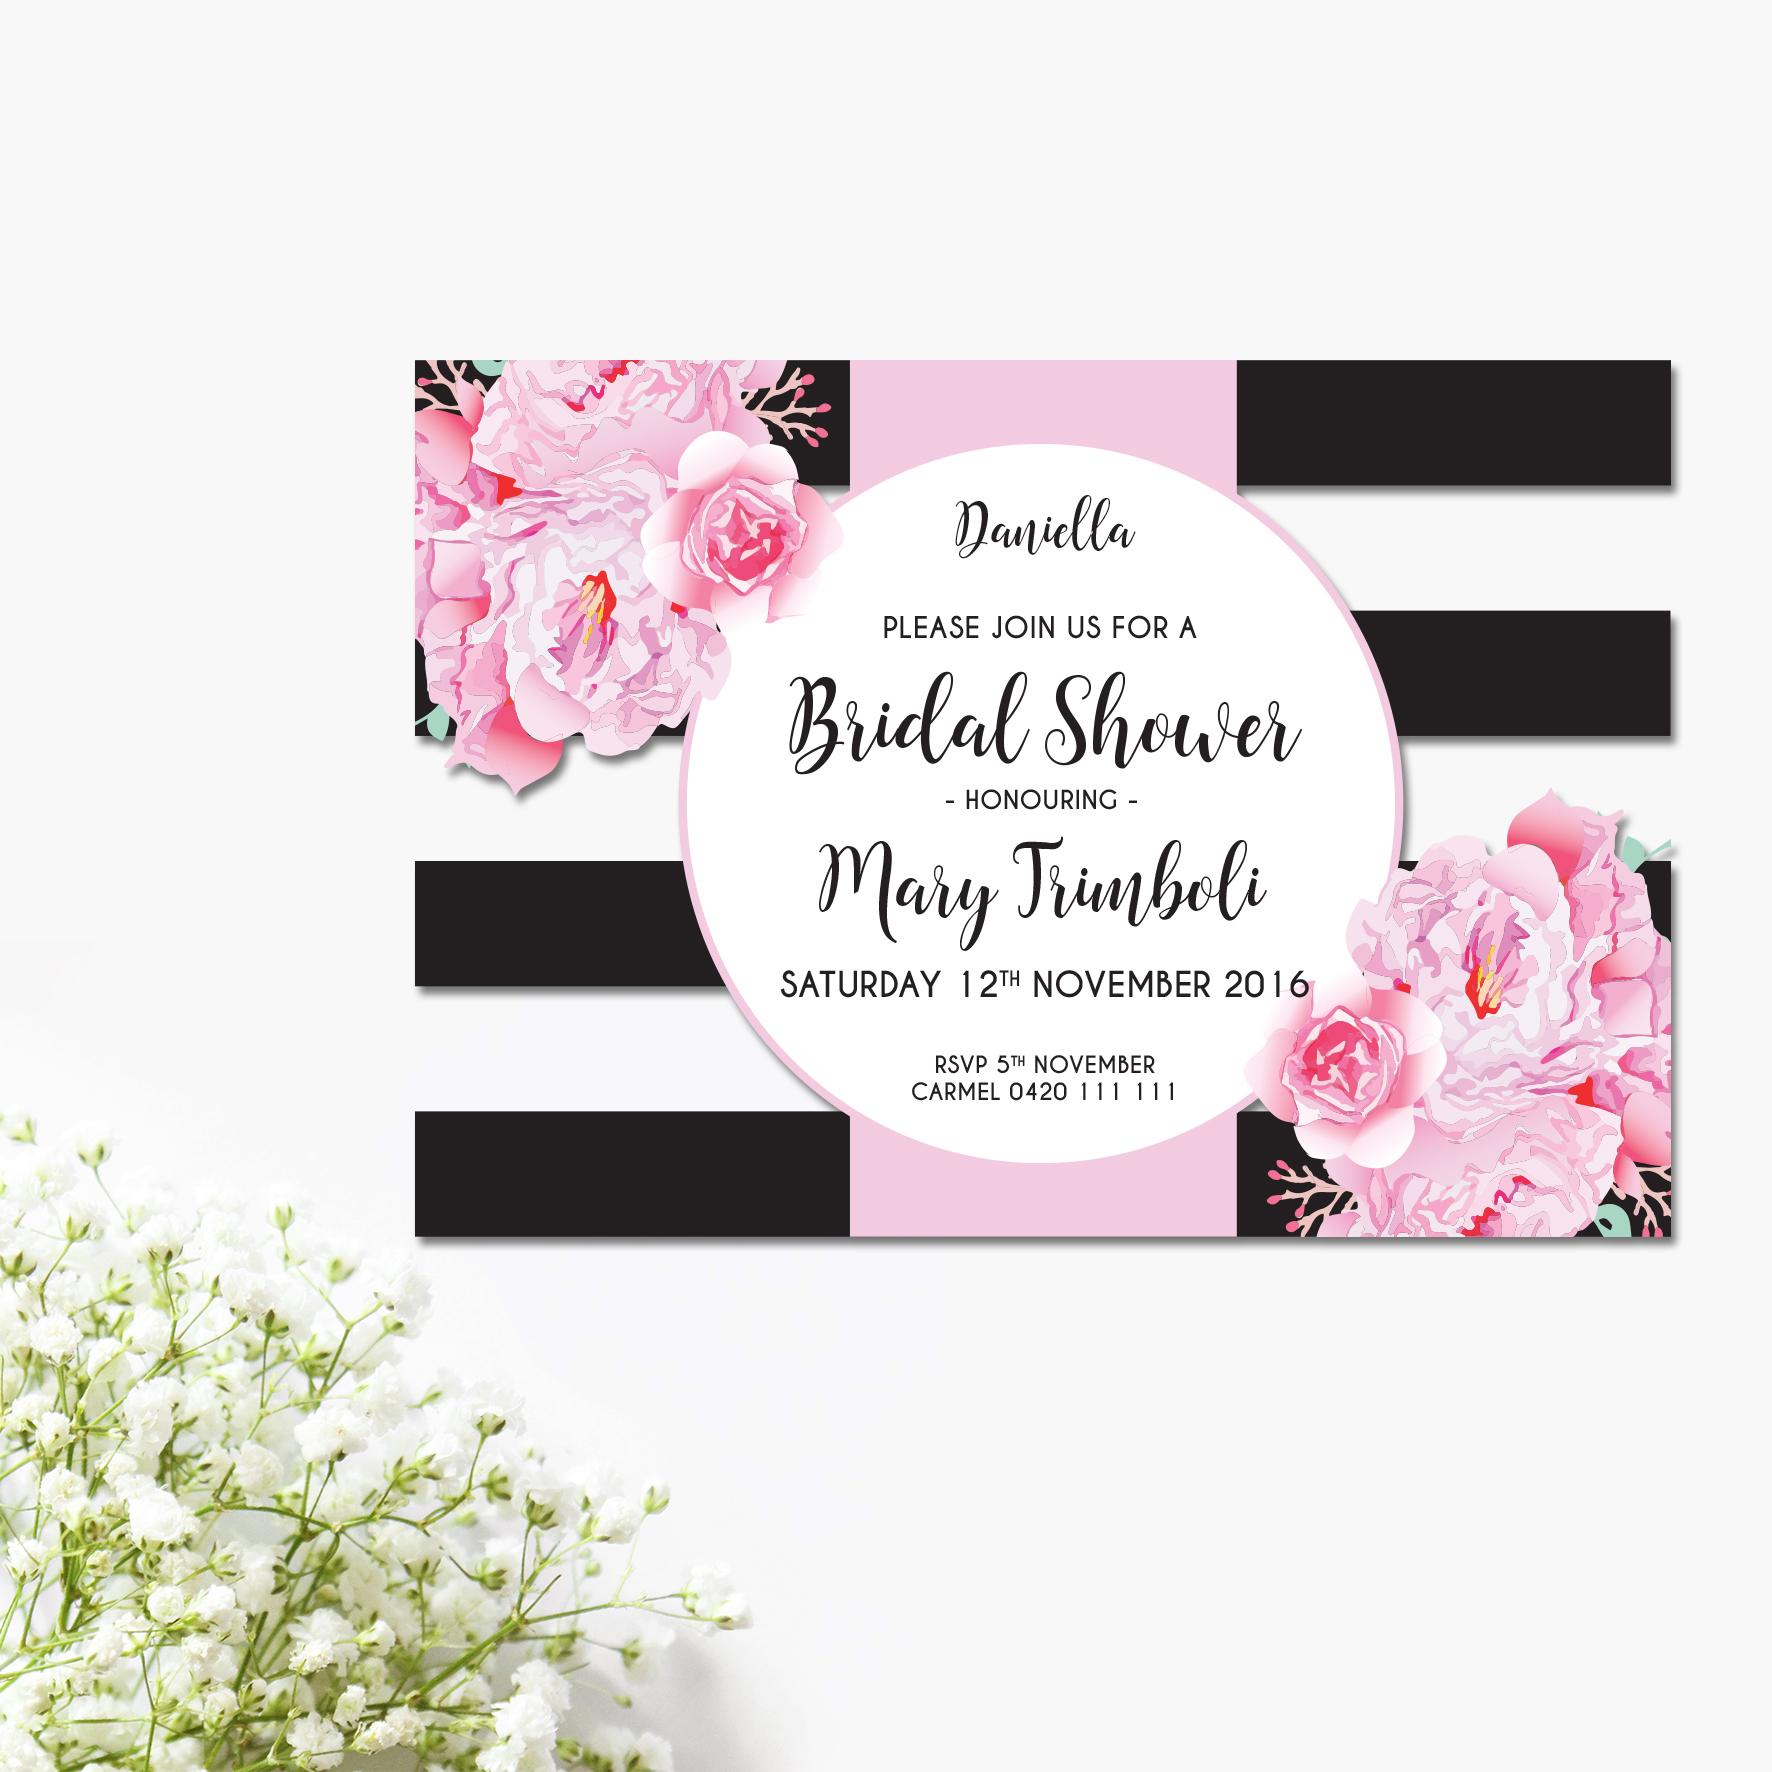 Mary Bridal Shower